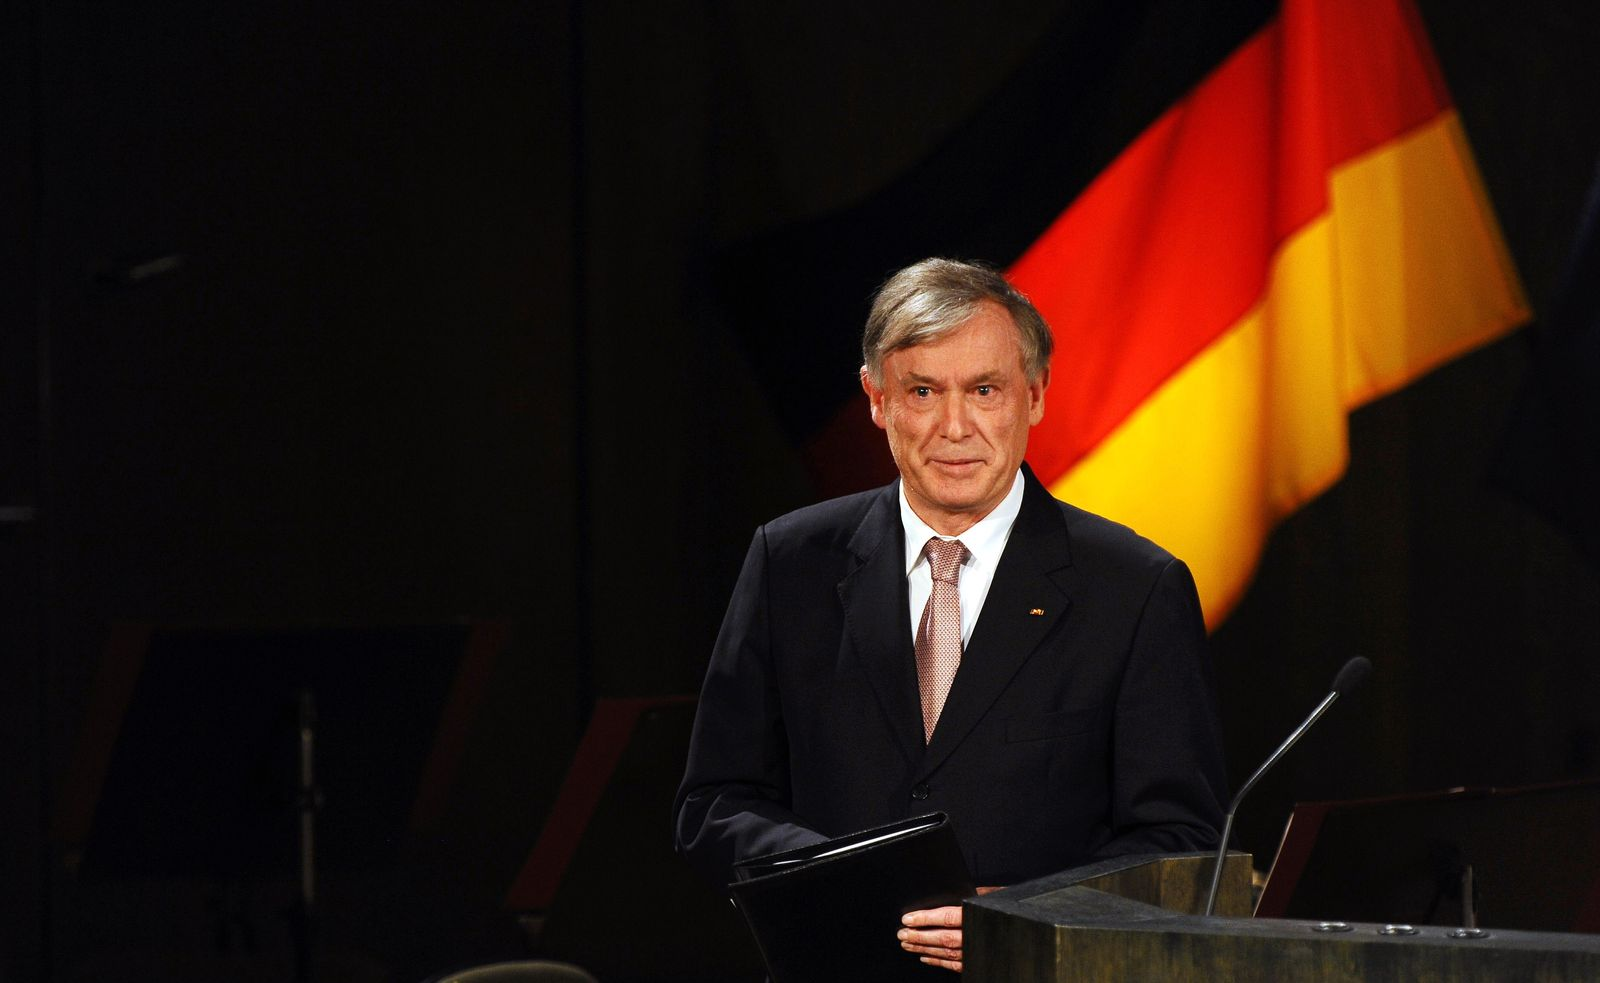 THEMEN Politik / Horst Köhler